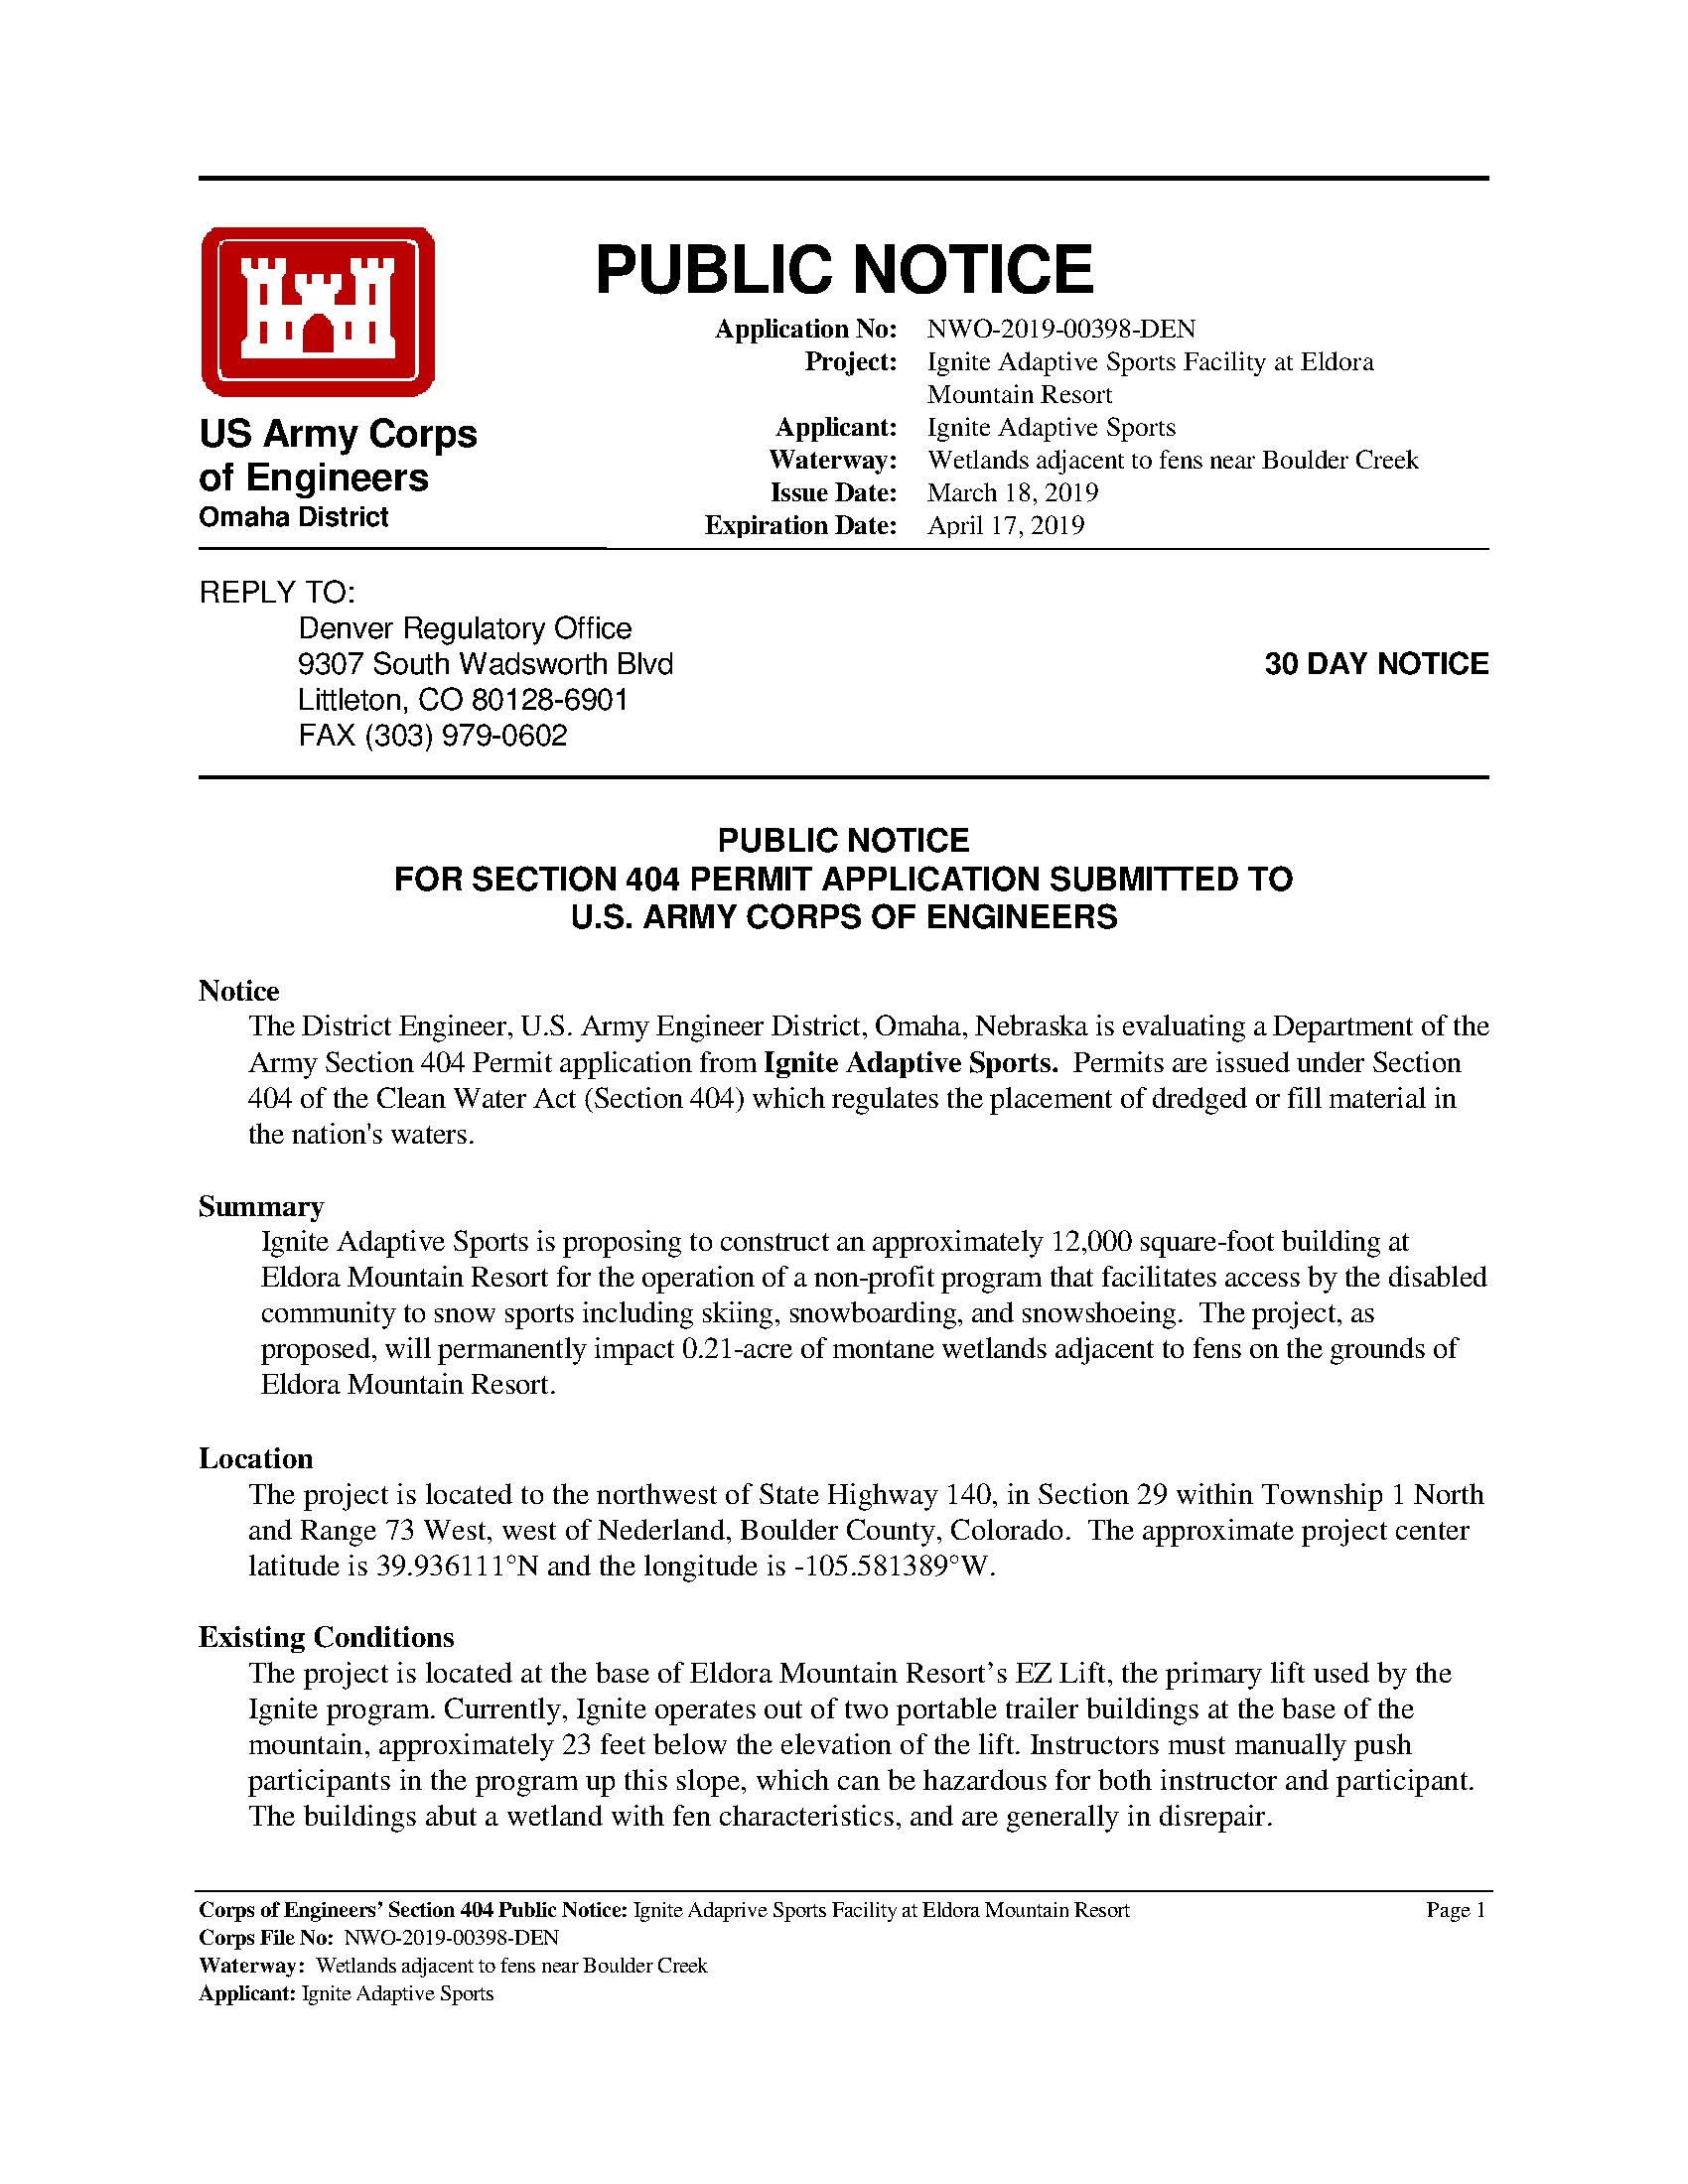 Public notice: Application no: NWO-2019-00398-DEN - Project